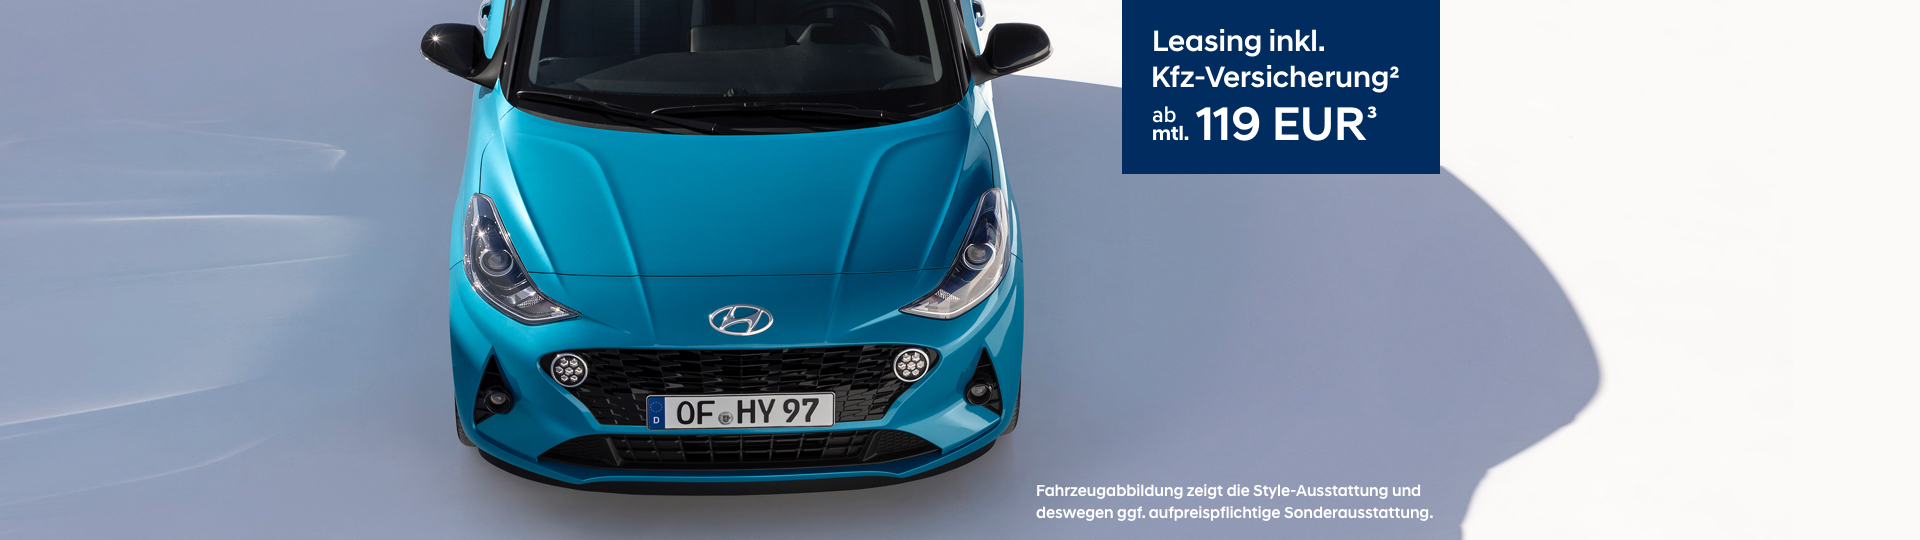 Hyundai i10 - Leasingrate